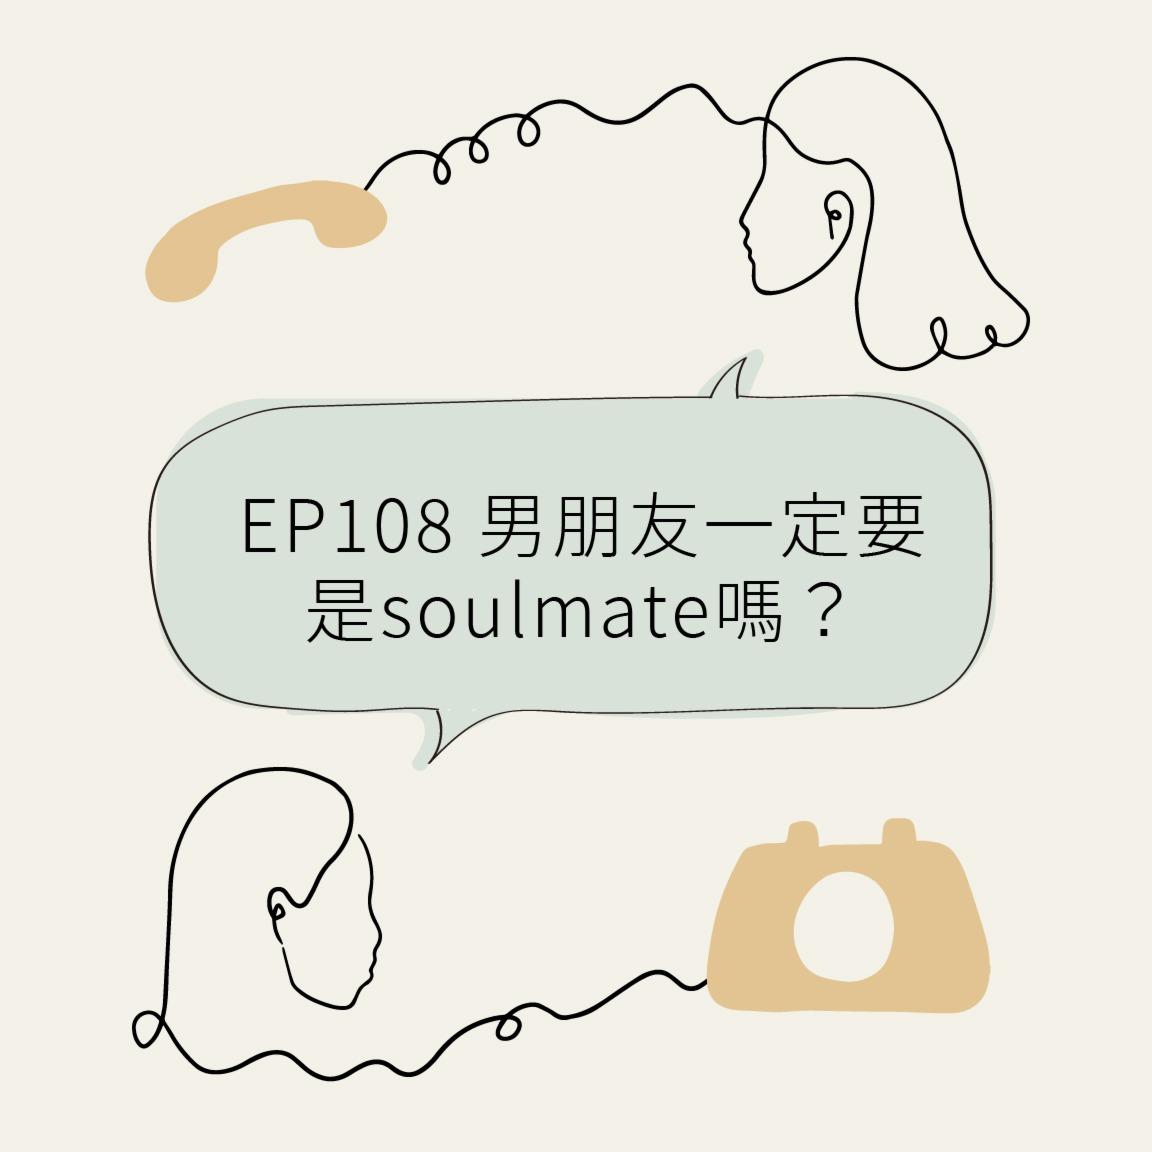 EP108 男朋友一定要是soulmate吗?